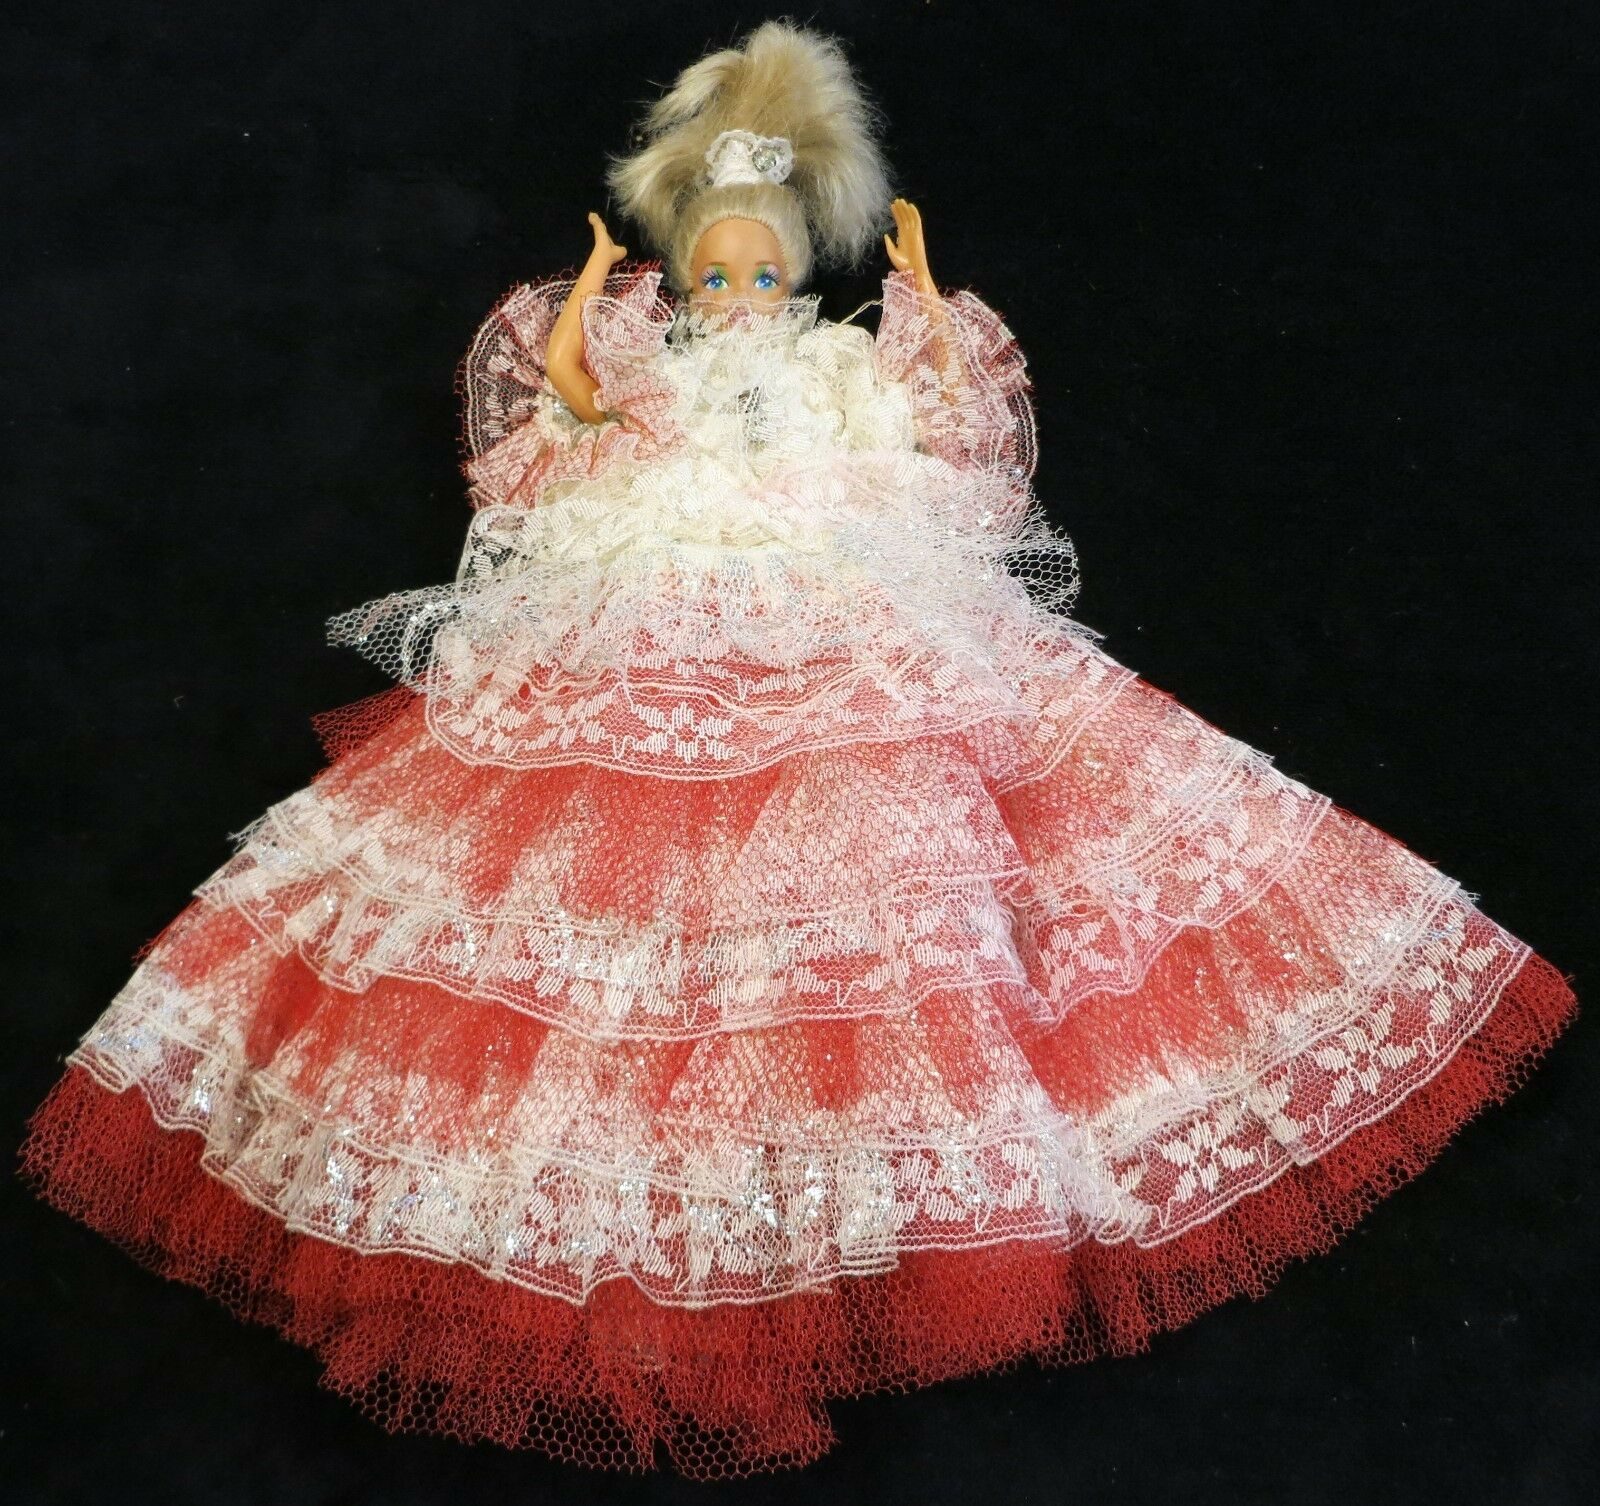 Mattel 1966 Barbie Wearing Red & White Dress Made in Taiwan - $6.67